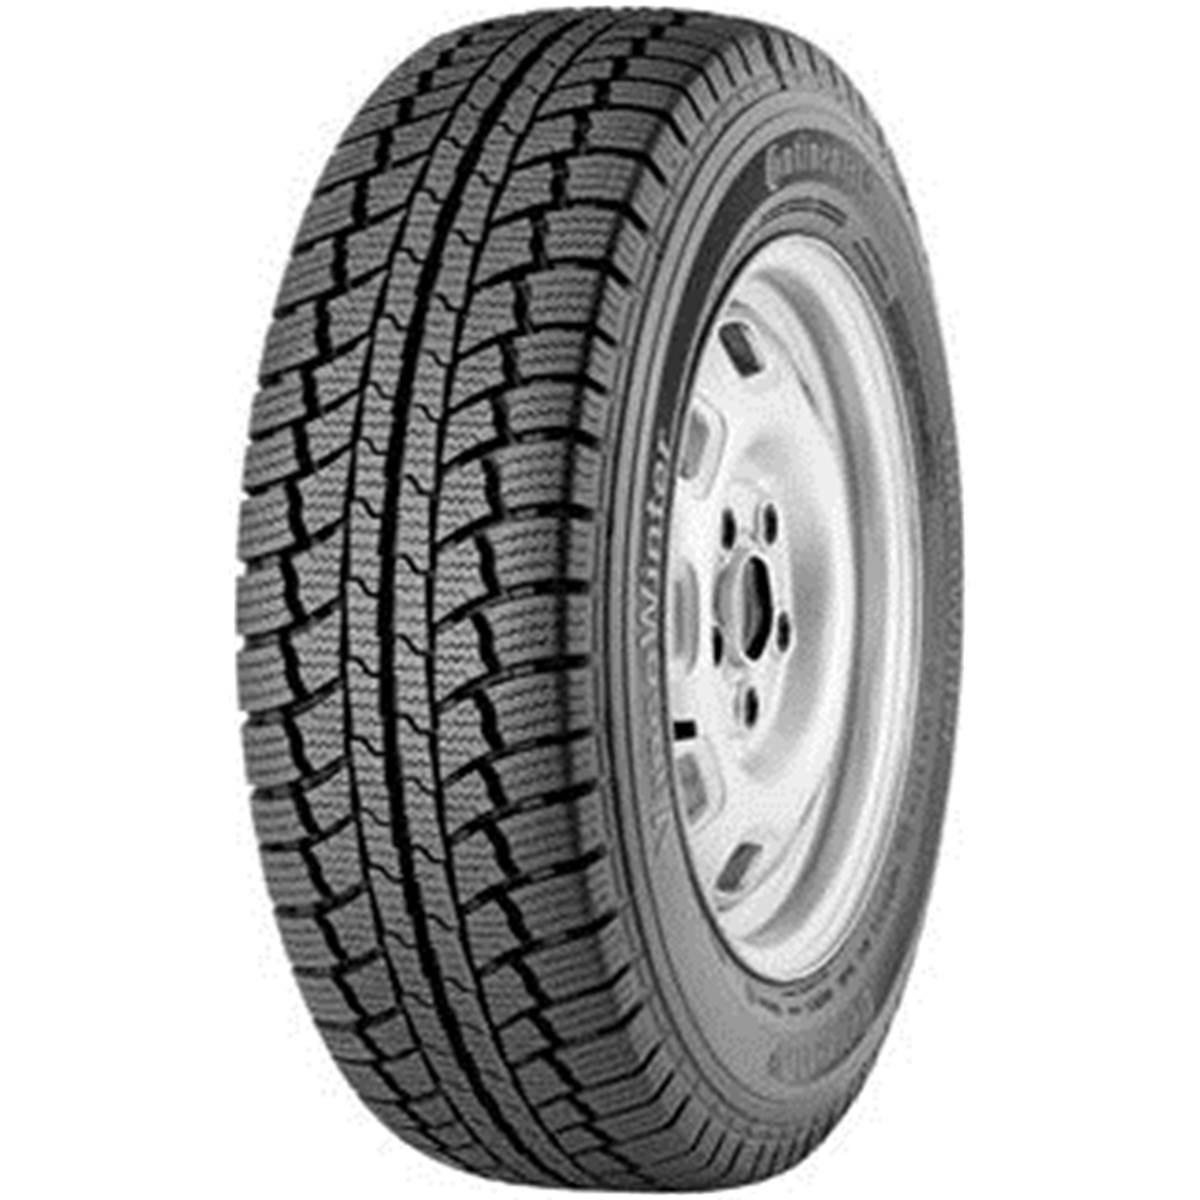 pneu hiver pas cher achat vente pneu acheter pneus hiver pas cher pneus hiver de marque kumho. Black Bedroom Furniture Sets. Home Design Ideas